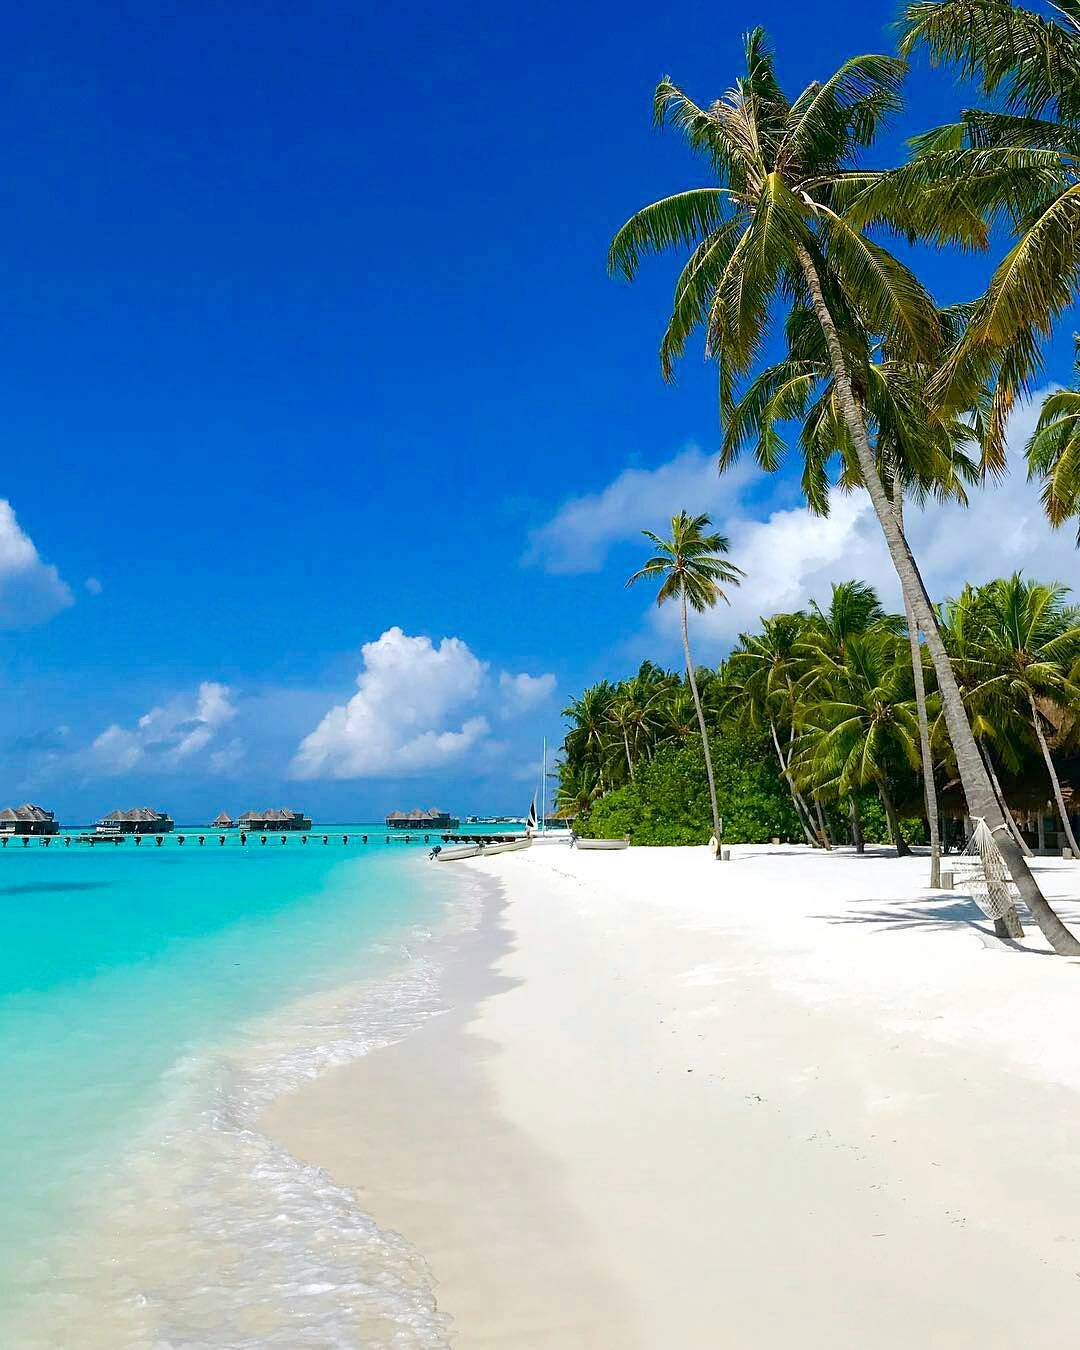 Maldives Beach: Maldives - Repinned By @youngandmerri